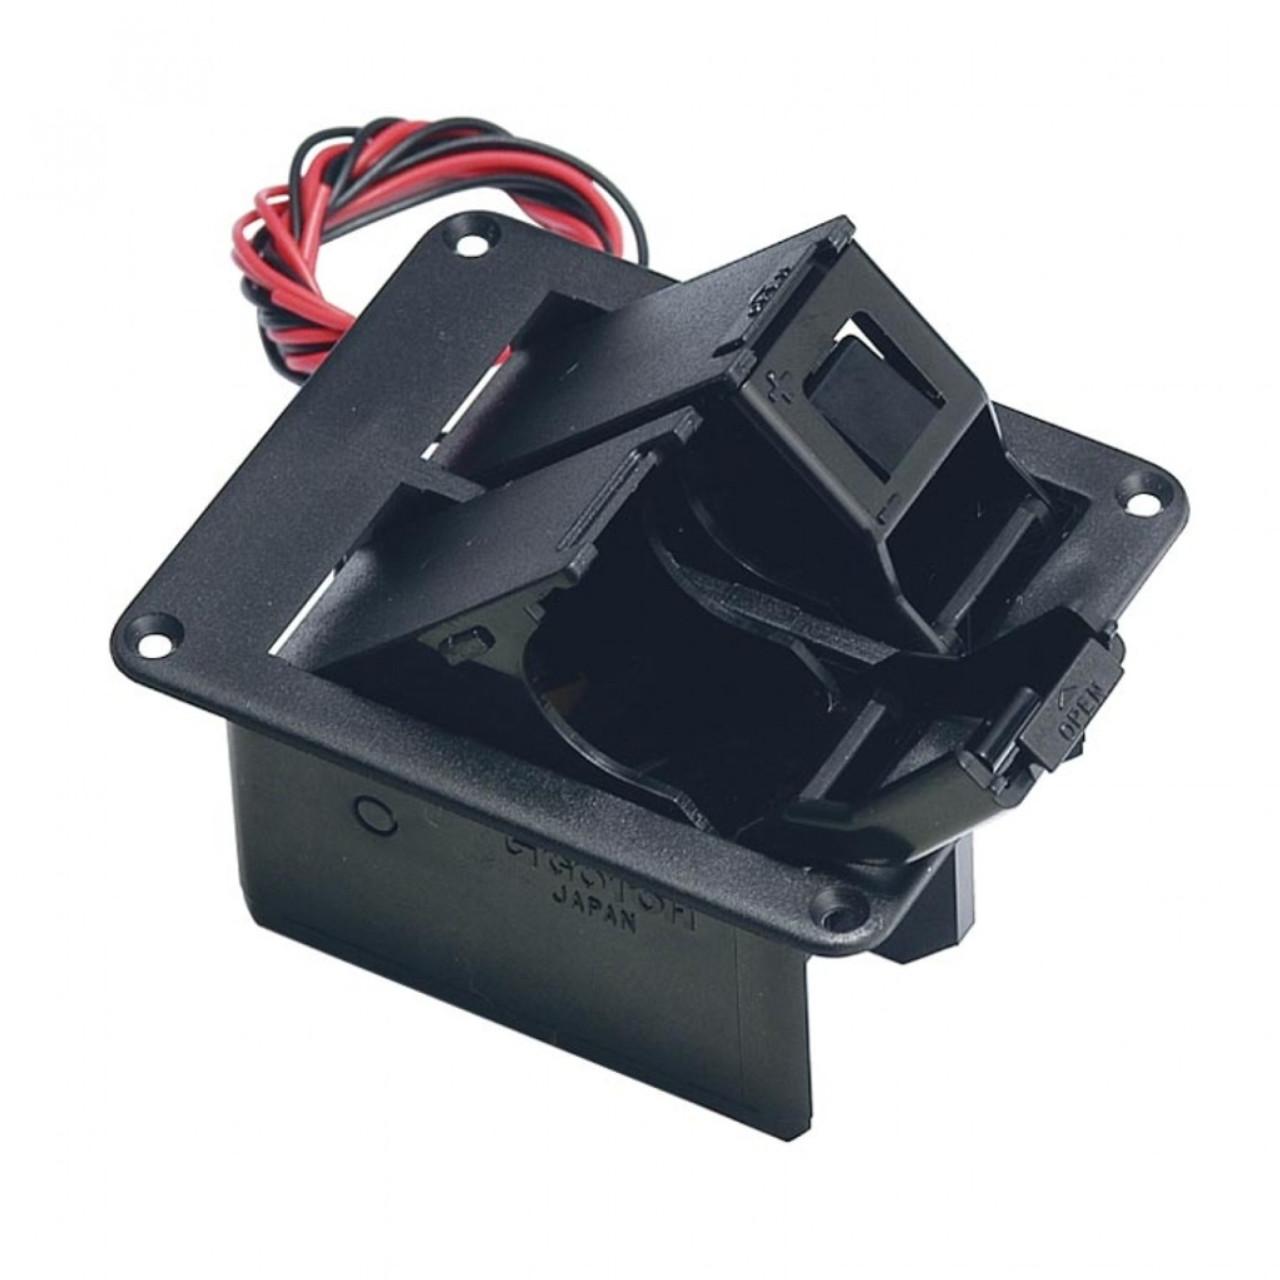 Gotoh BB-04W - 18V Battery Box (screw-in)